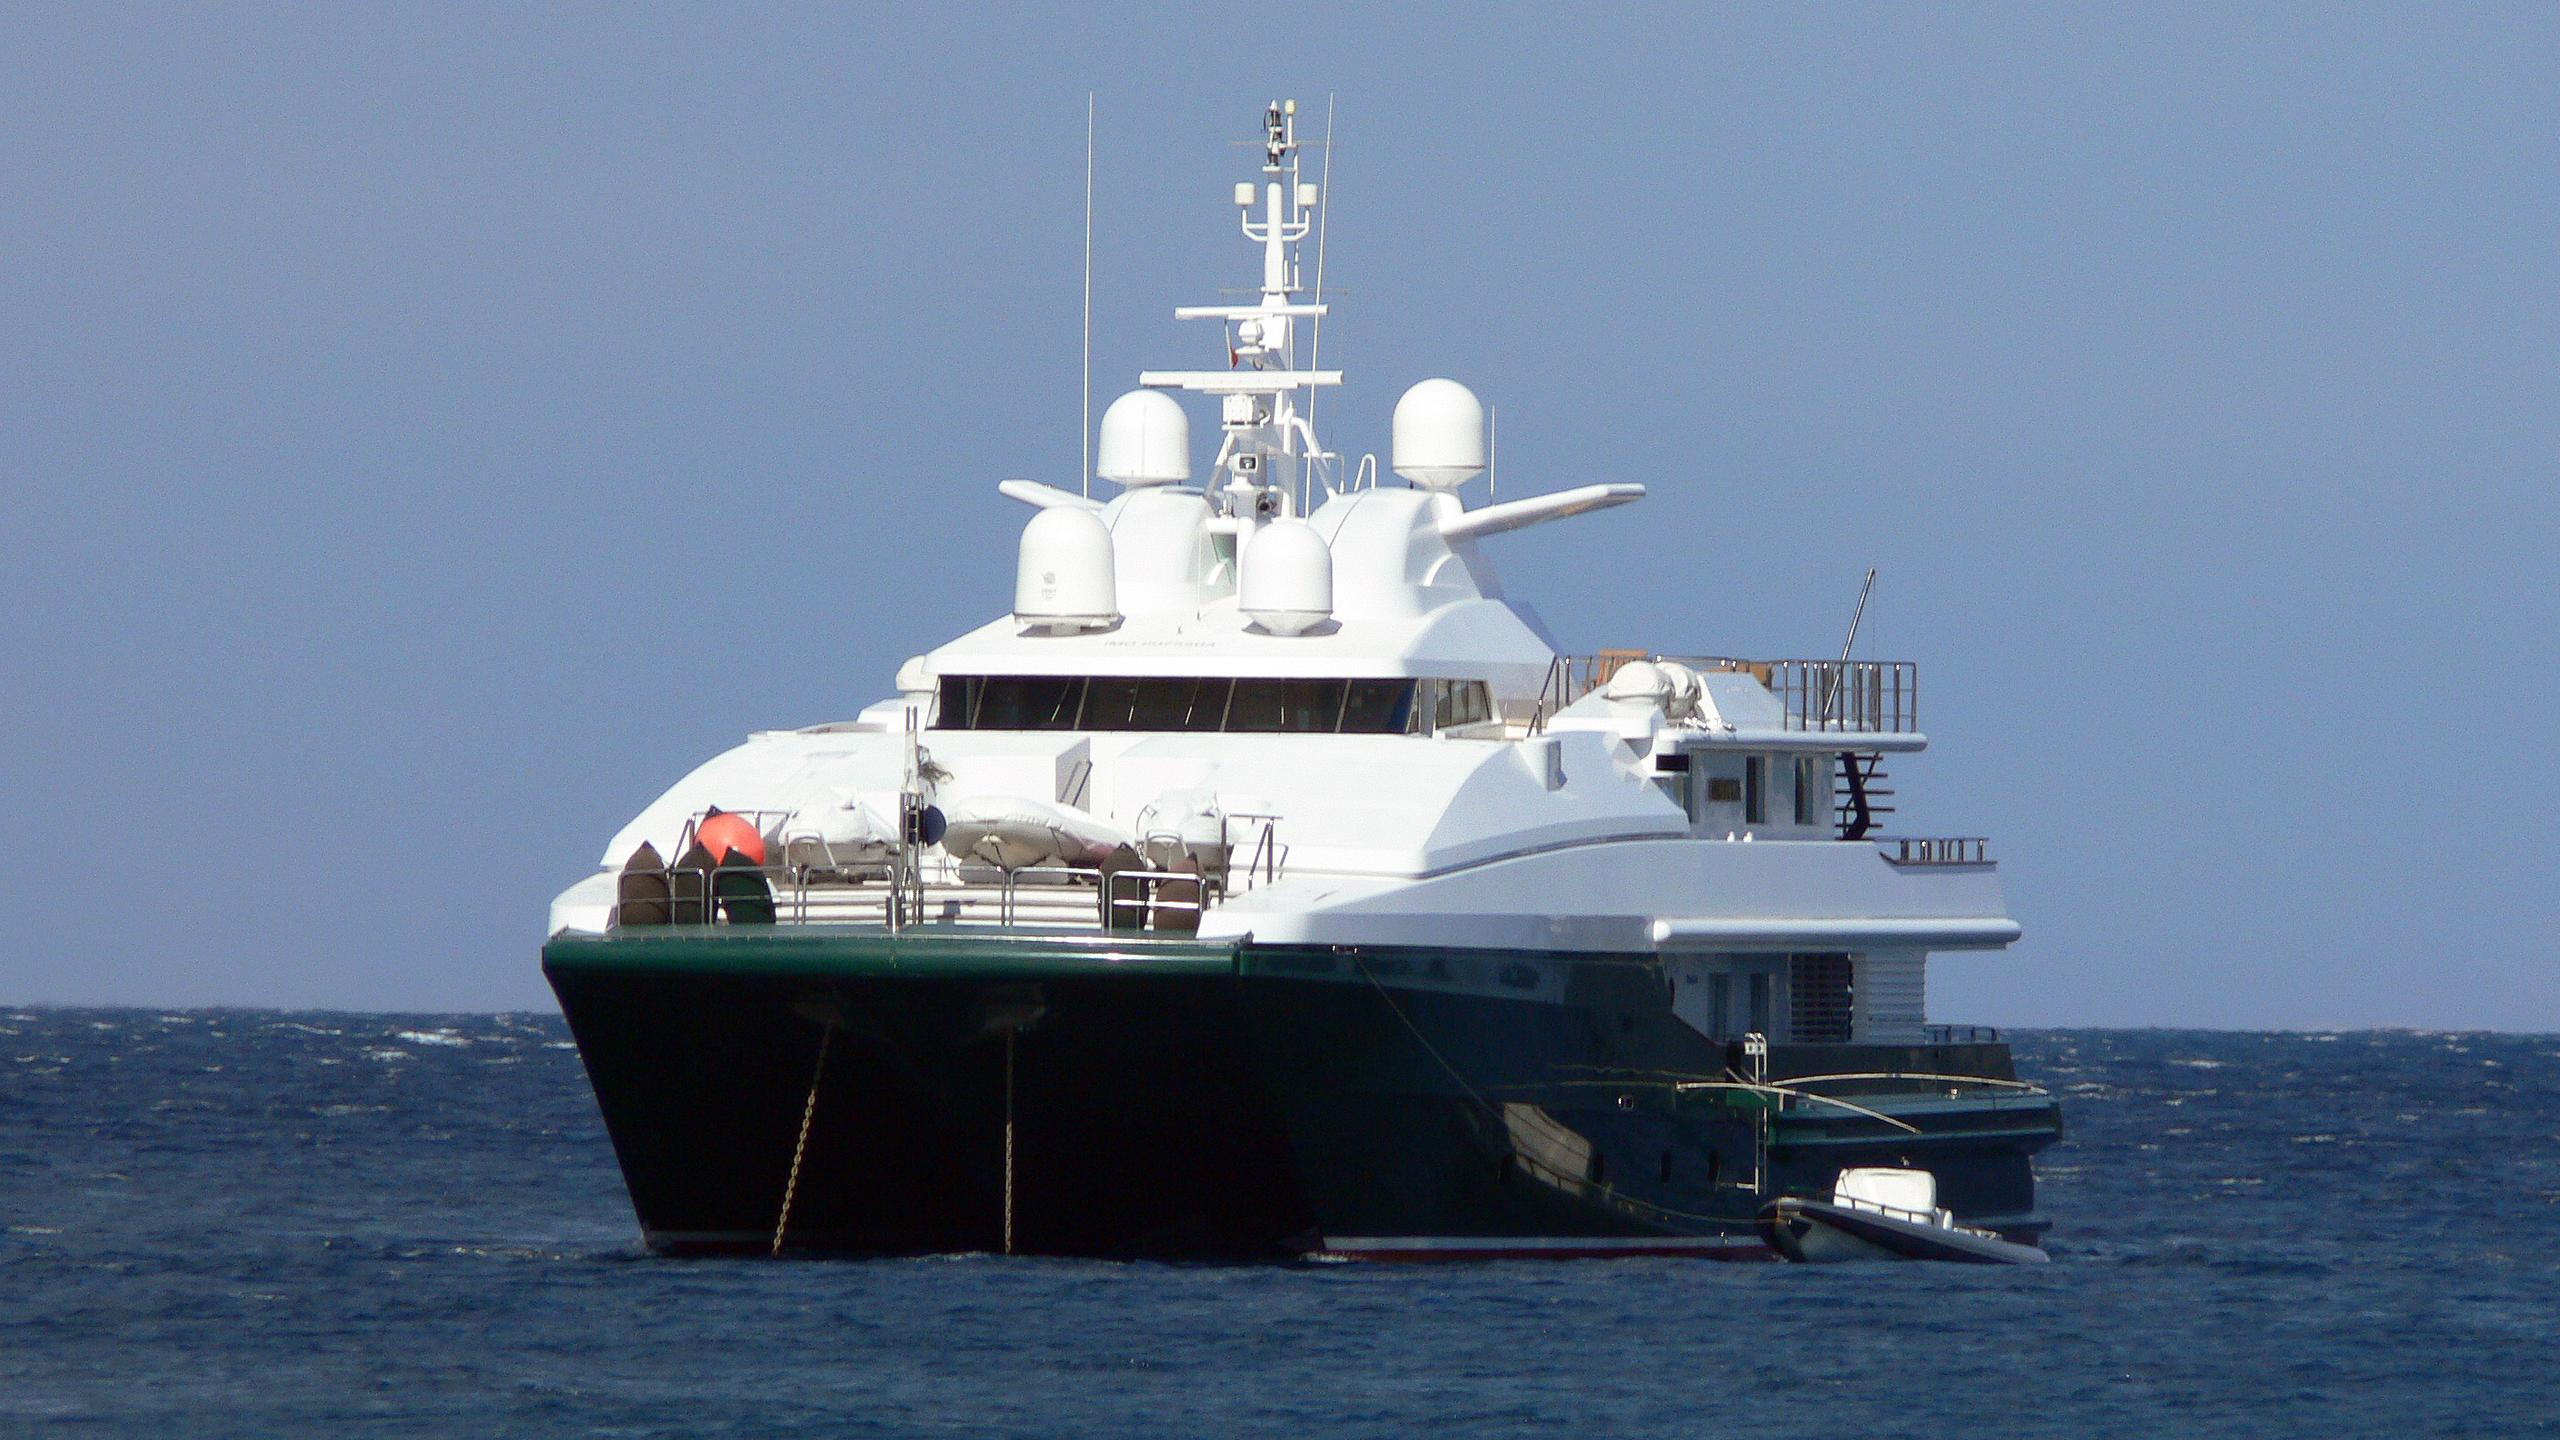 moecca-motor-yacht-oceanfast-1993-45m-bow